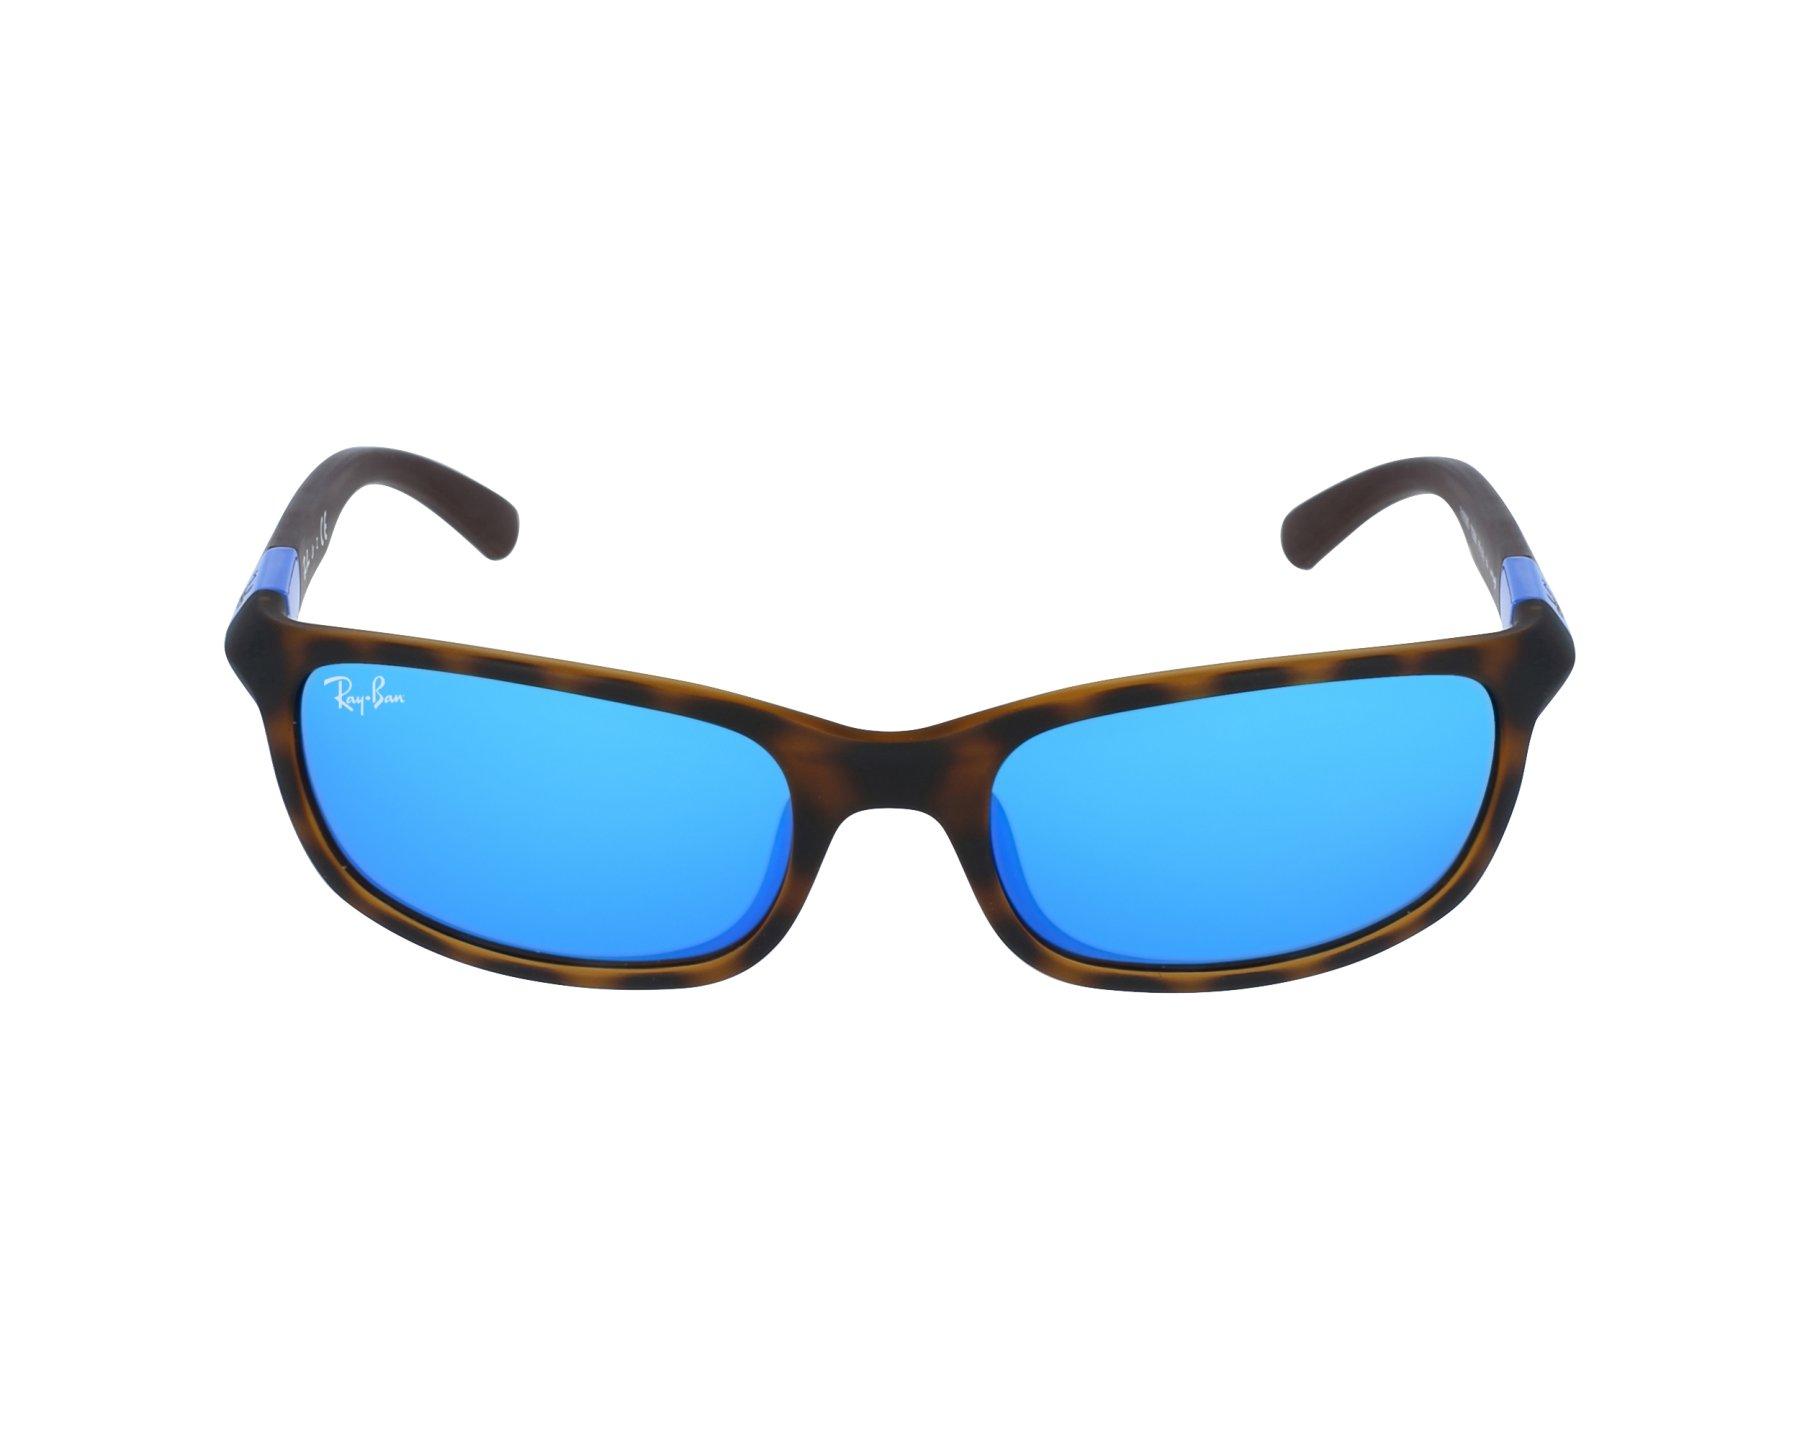 ray ban sonnenbrille junior rj 9056 s 702555. Black Bedroom Furniture Sets. Home Design Ideas